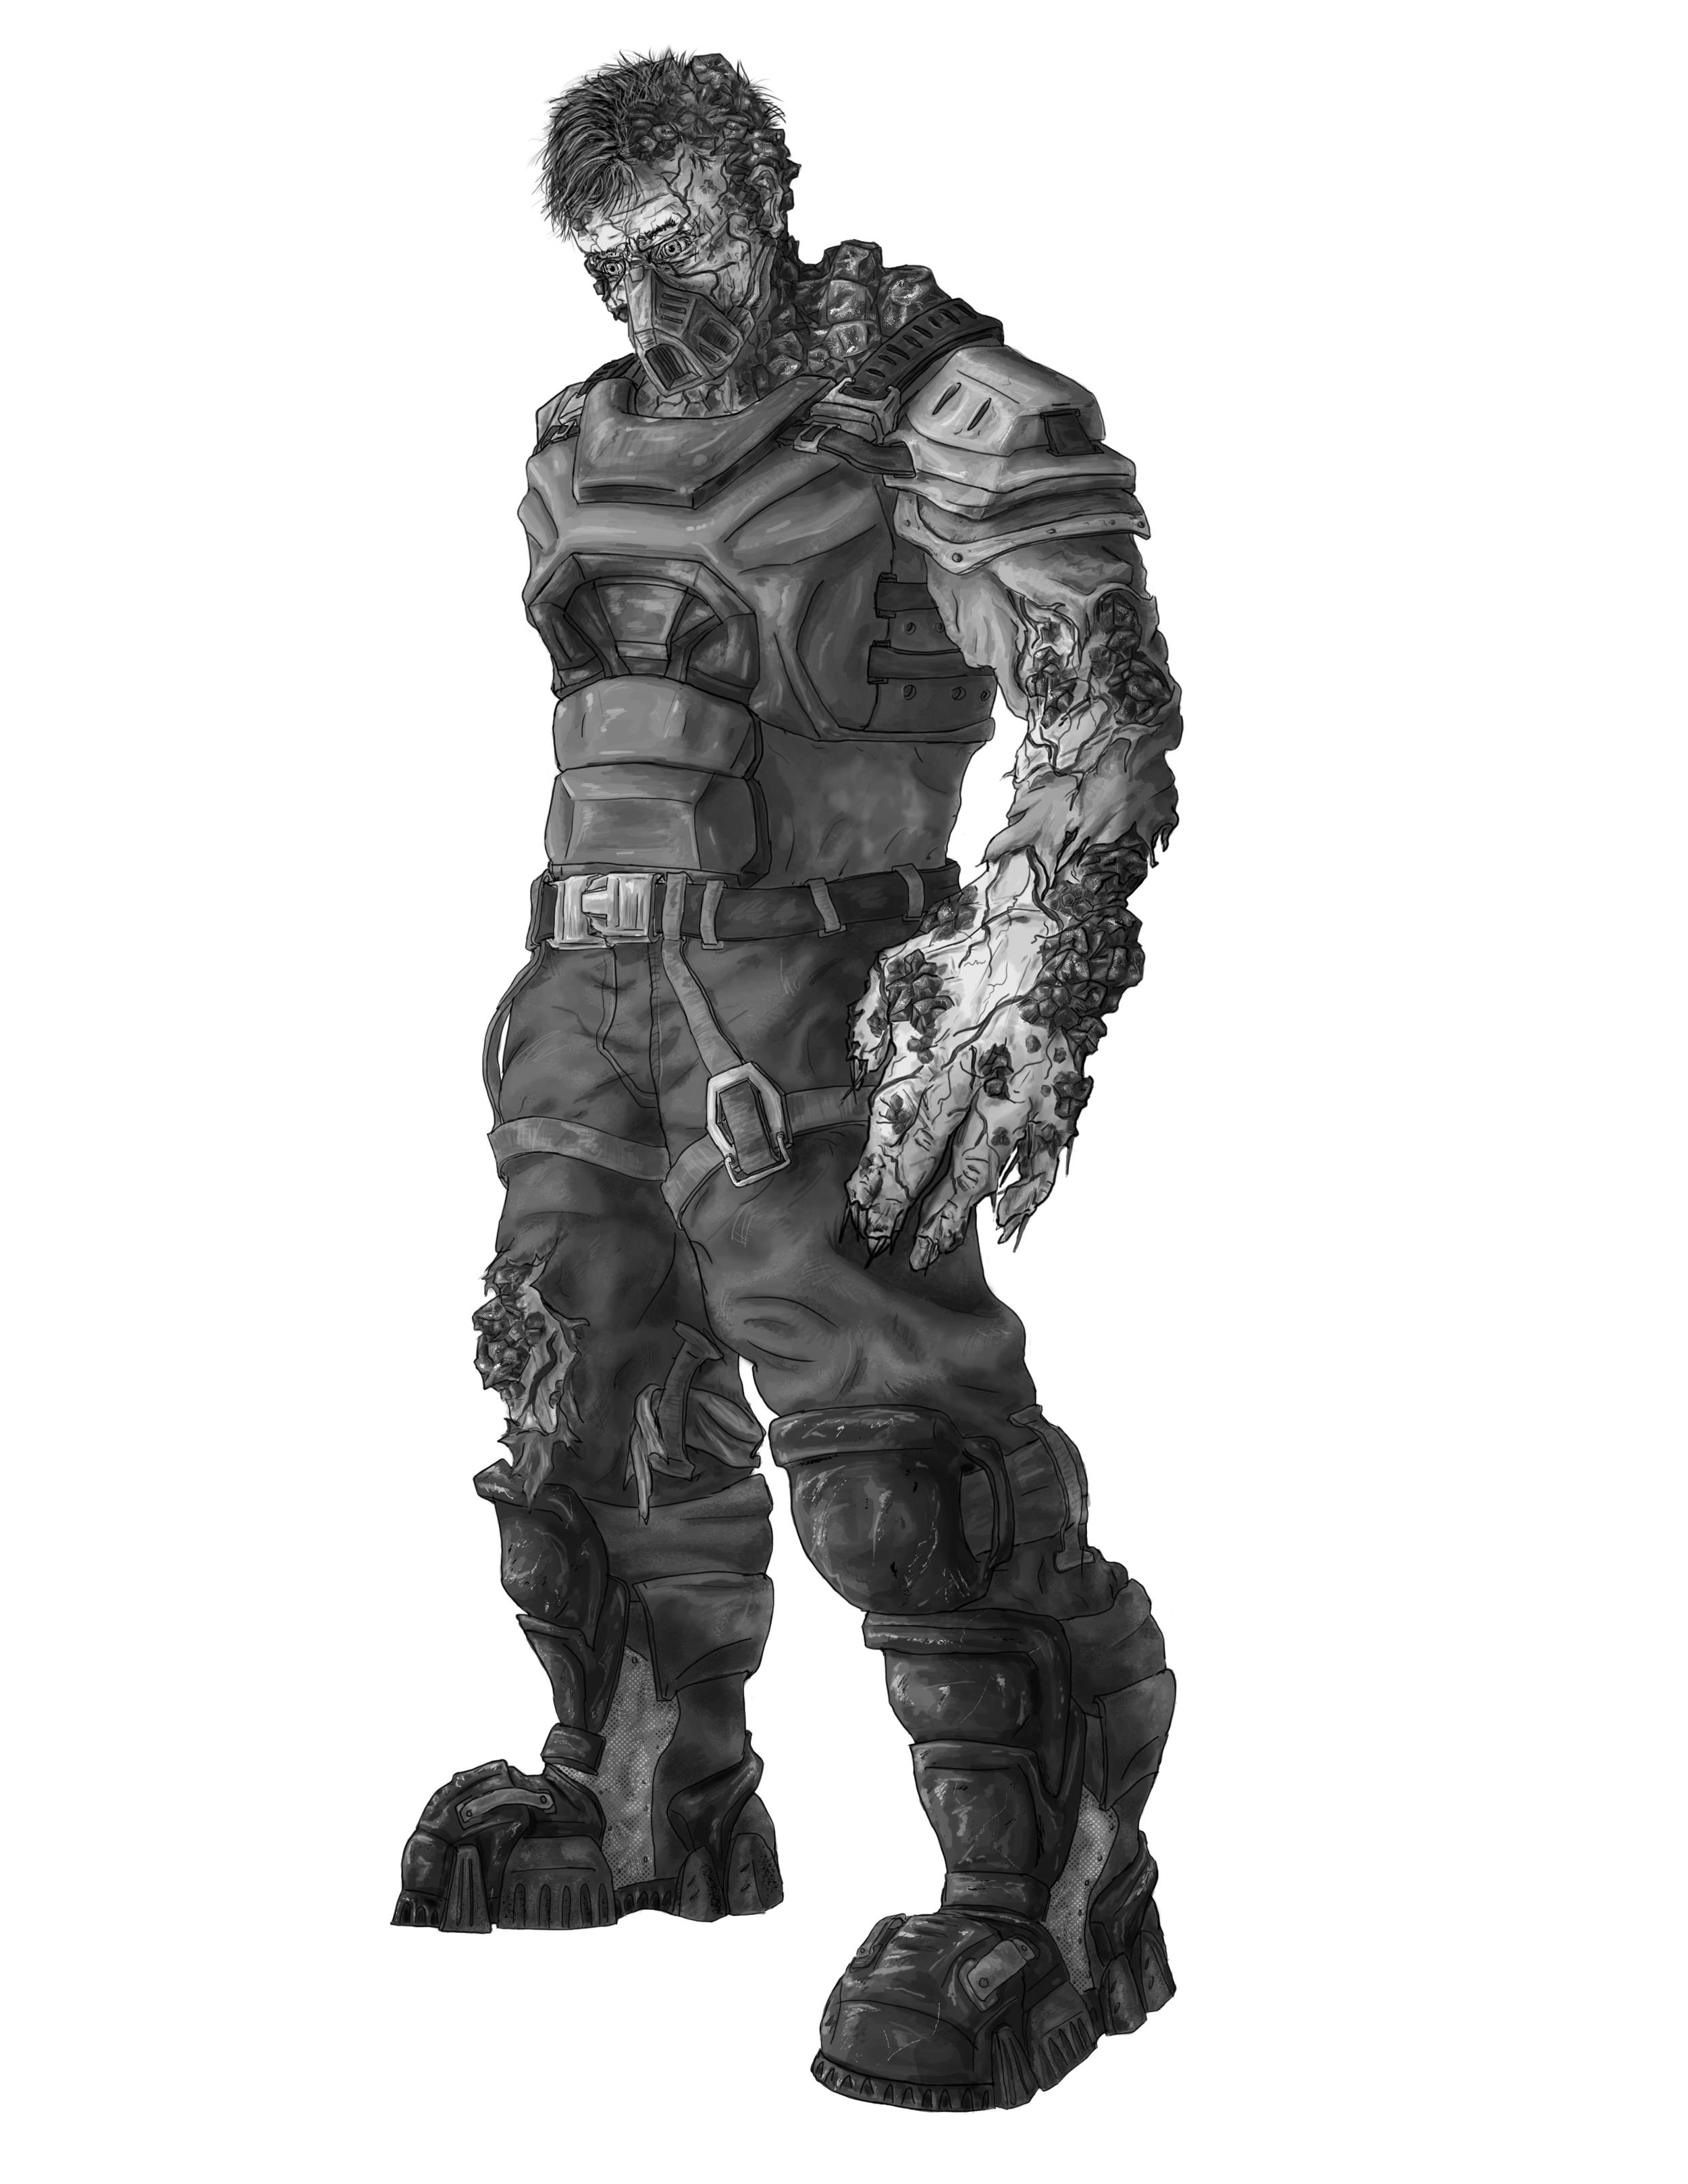 Enemy Soldier - Lower Level Grunt